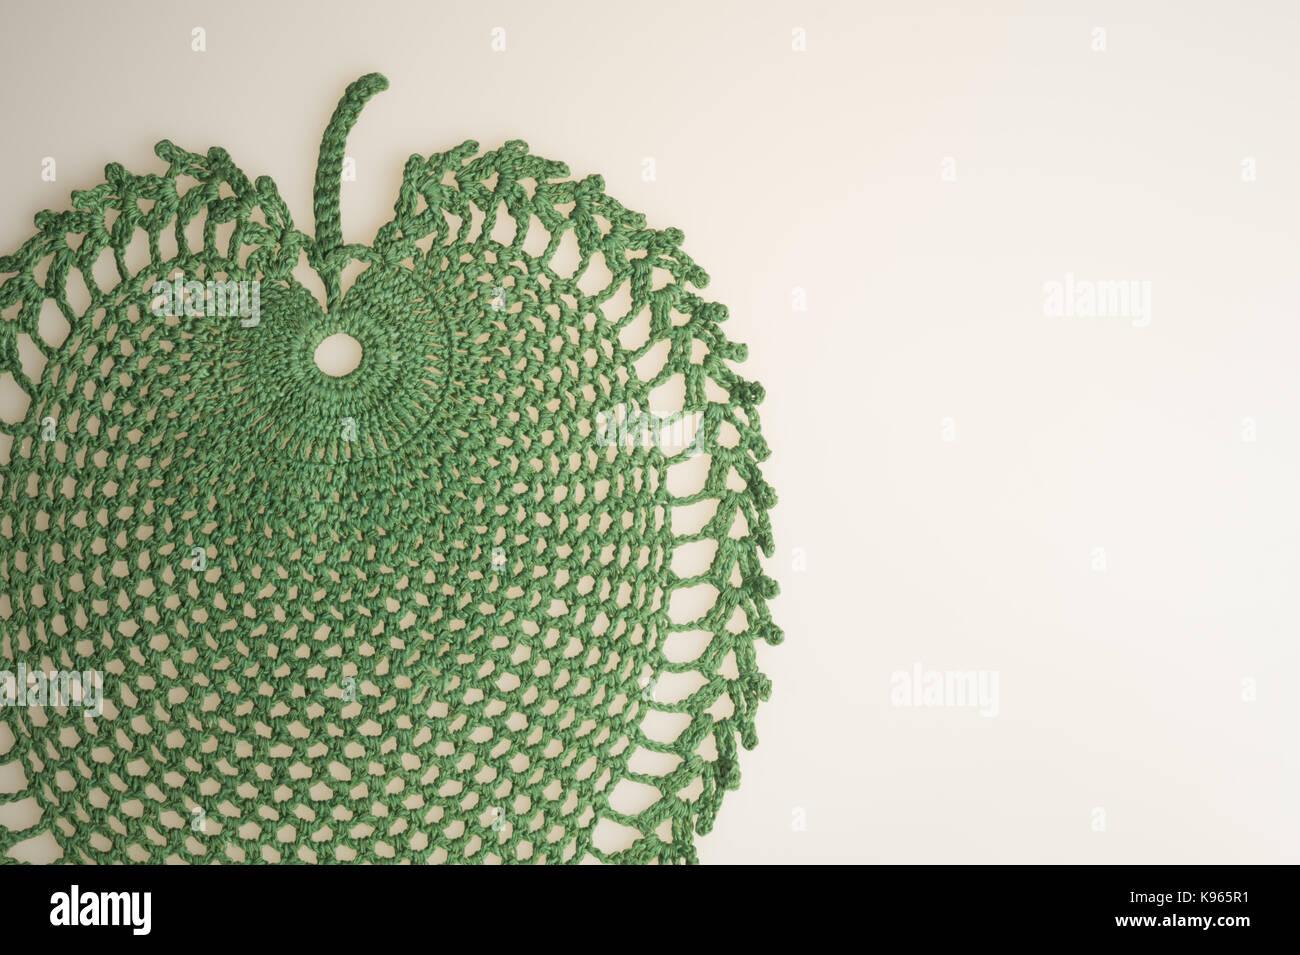 Leaf Knitting Pattern Stock Photos & Leaf Knitting Pattern Stock ...